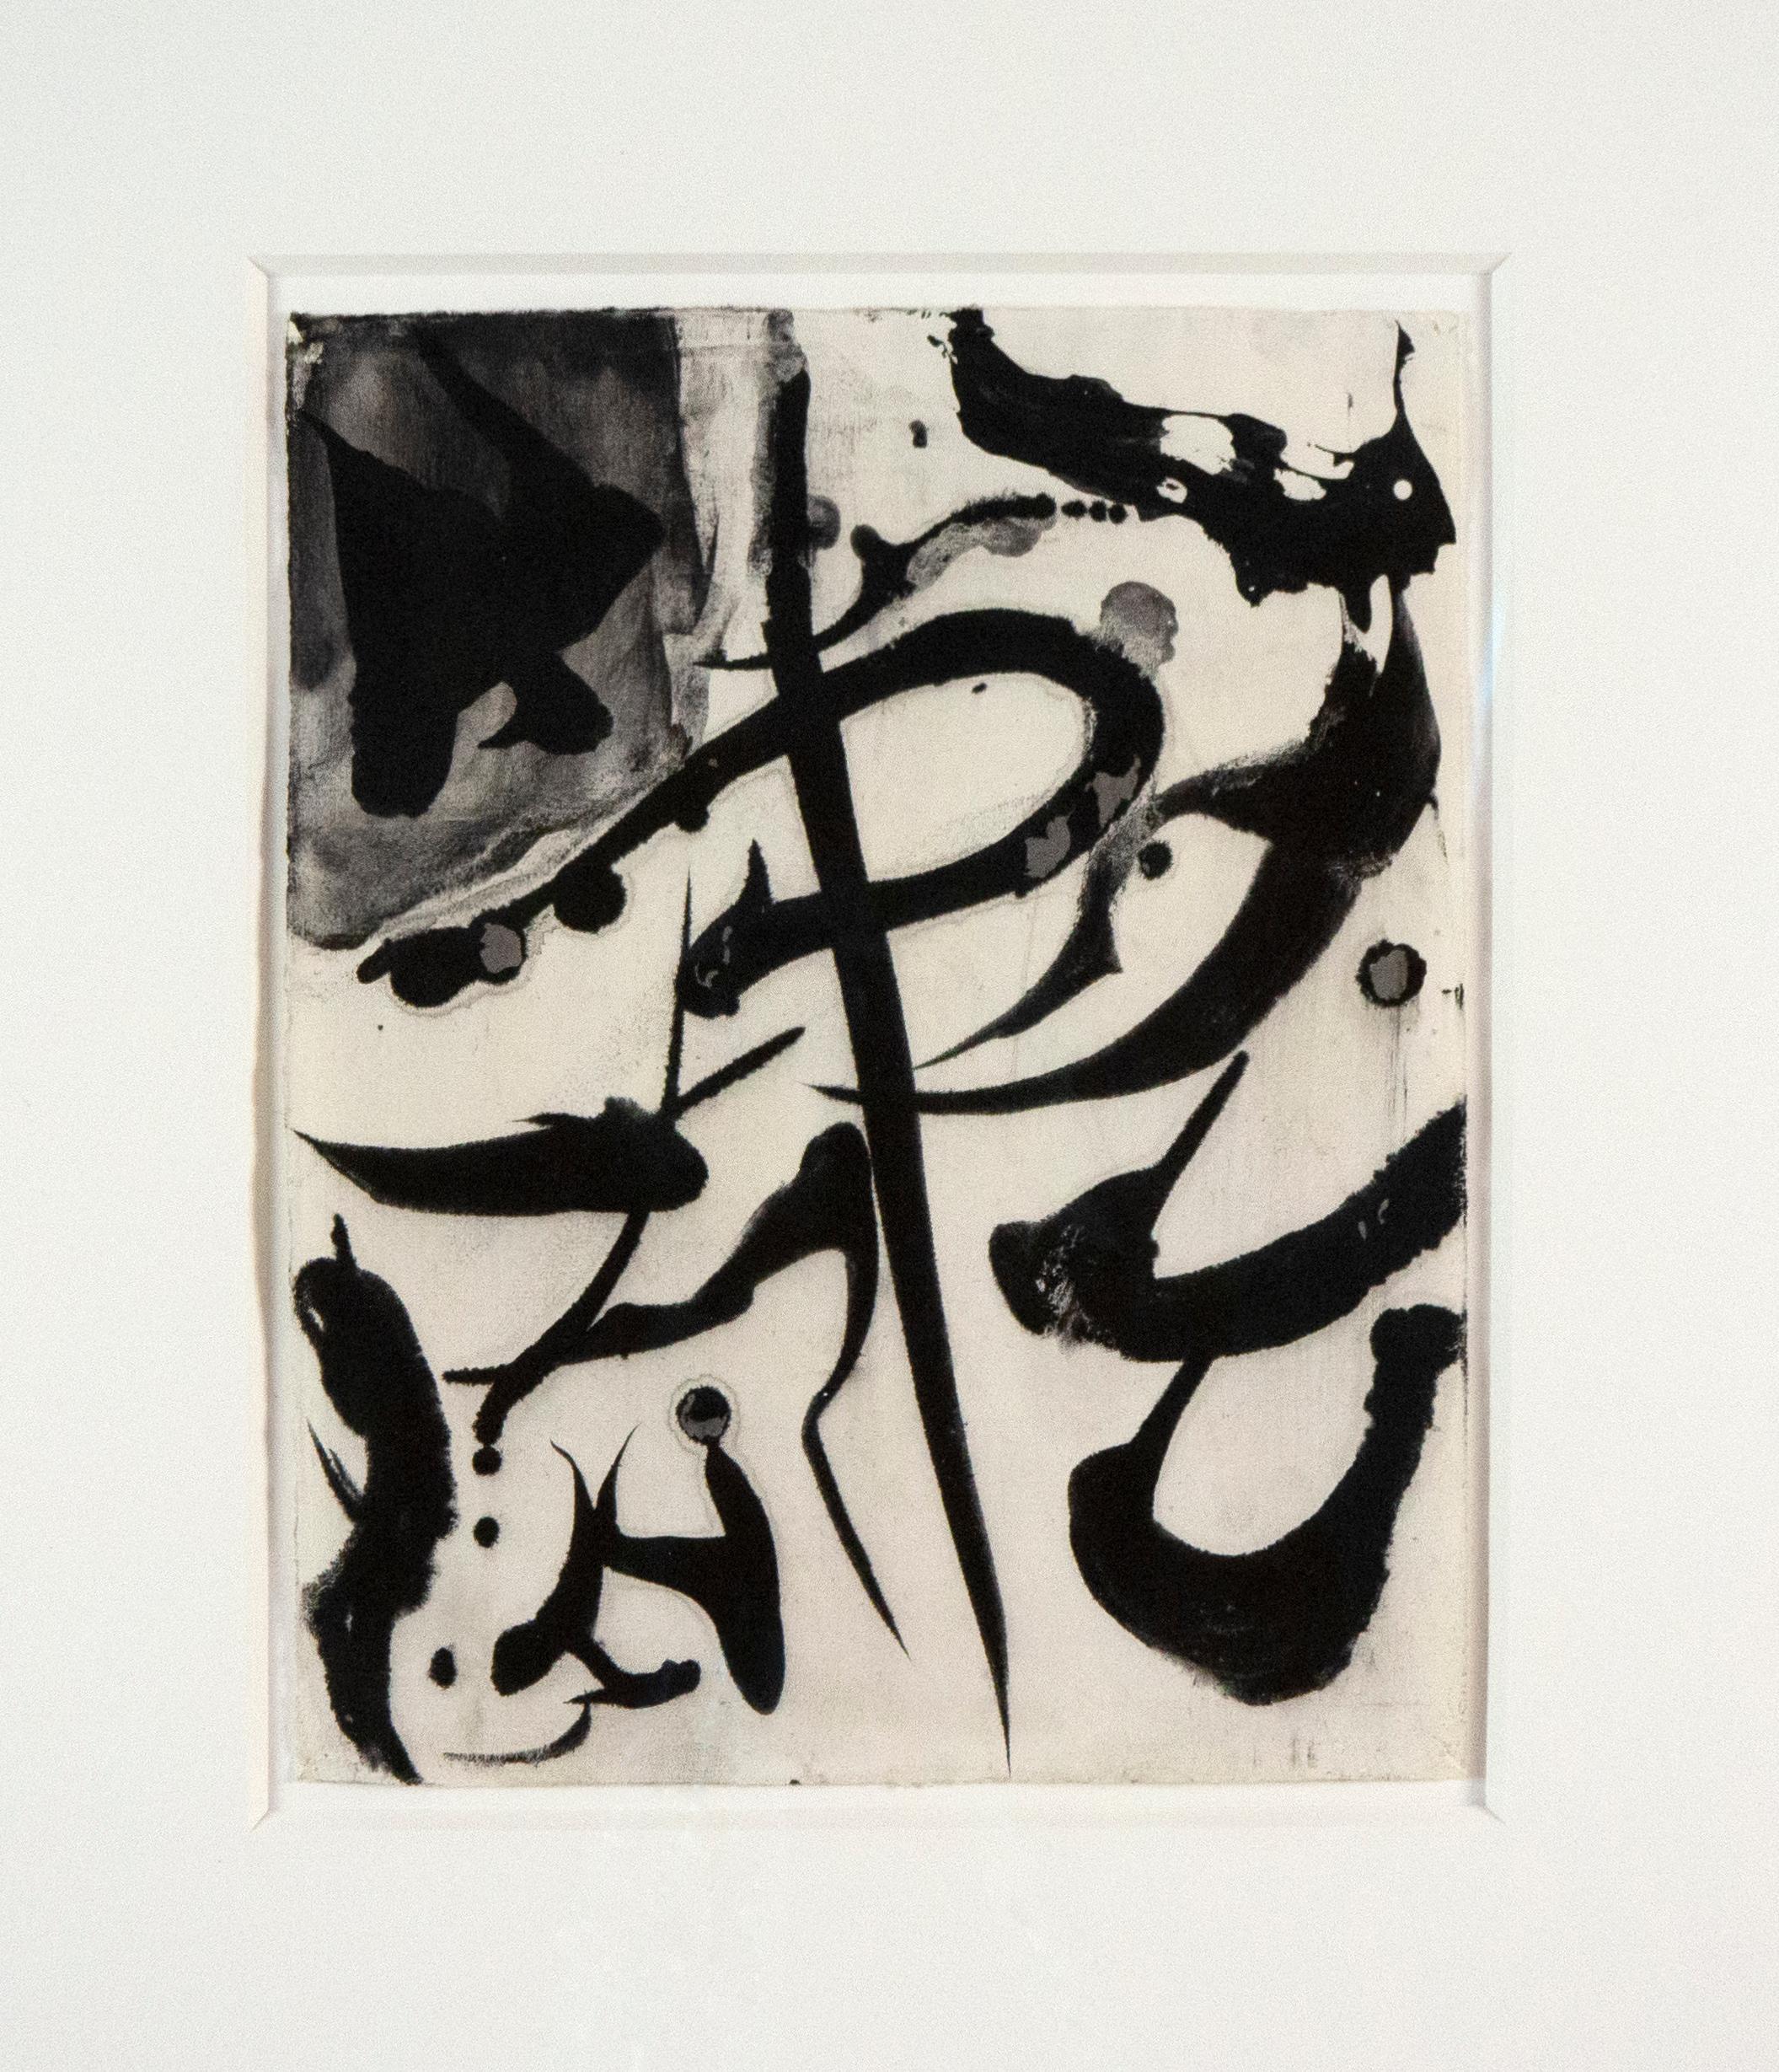 Bill Jensen, Drunken Brush IV, ink and tempera on paper, 2006